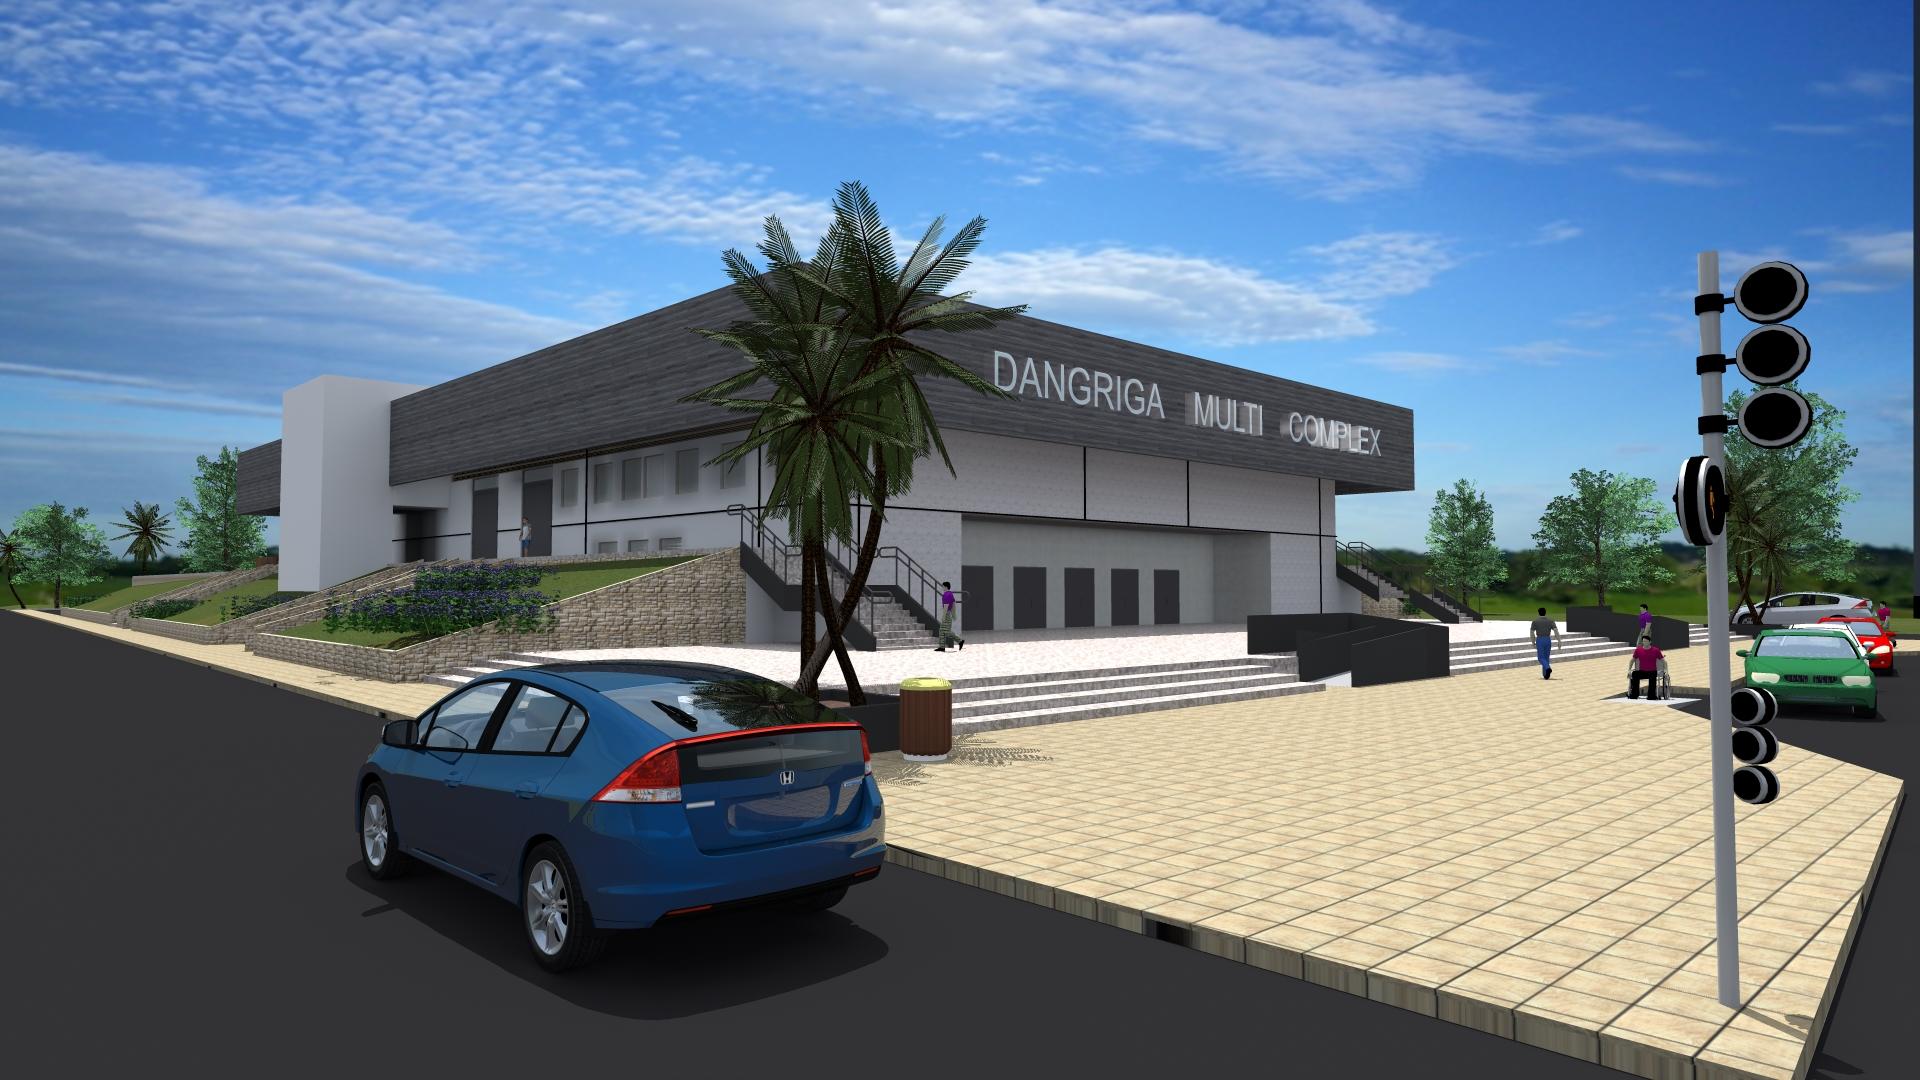 Dangriga Sporting Complex